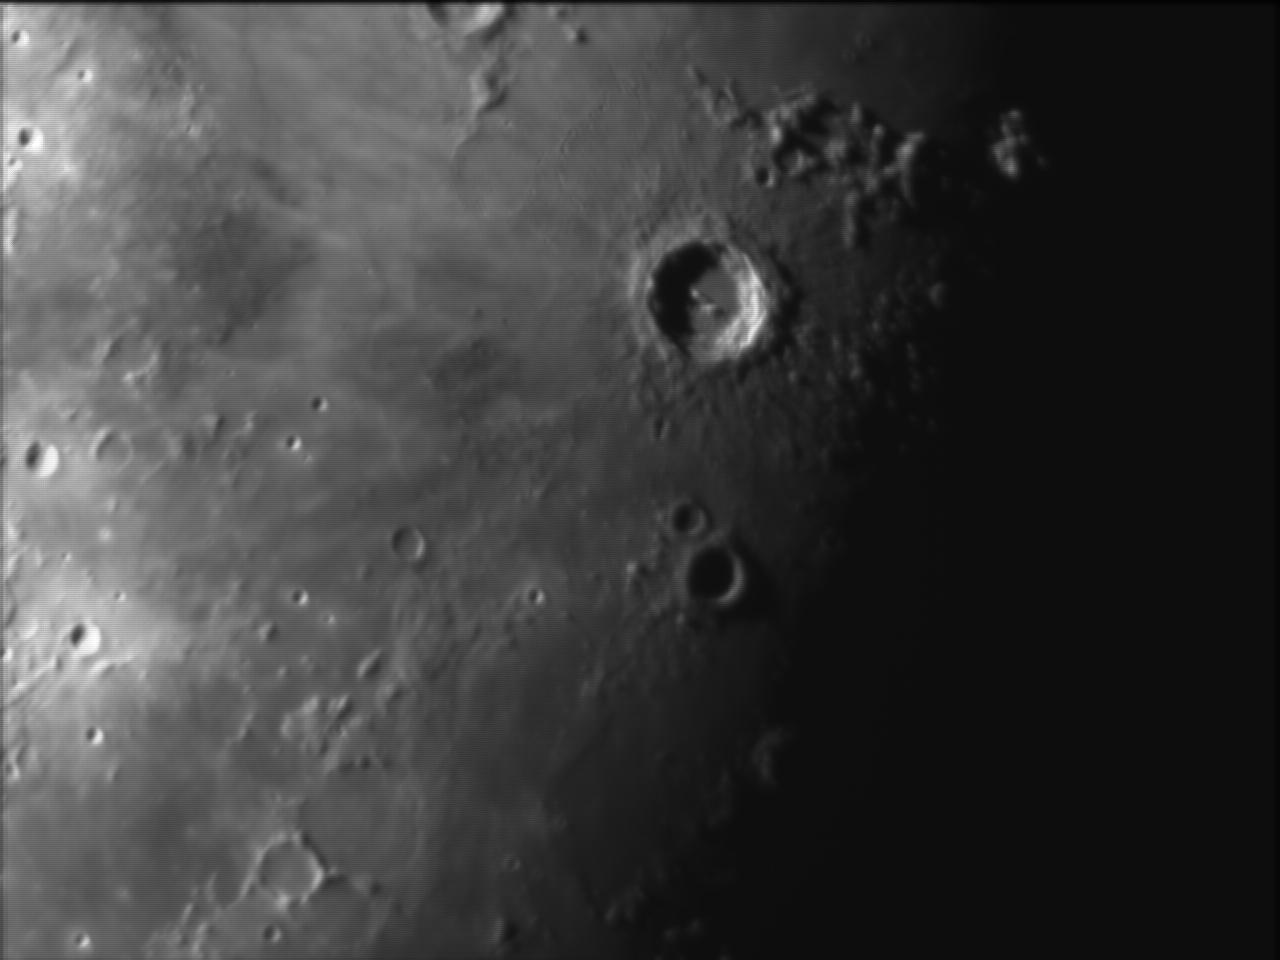 lune.jpg.f54b51e635381d3077500a5a1761119f.jpg